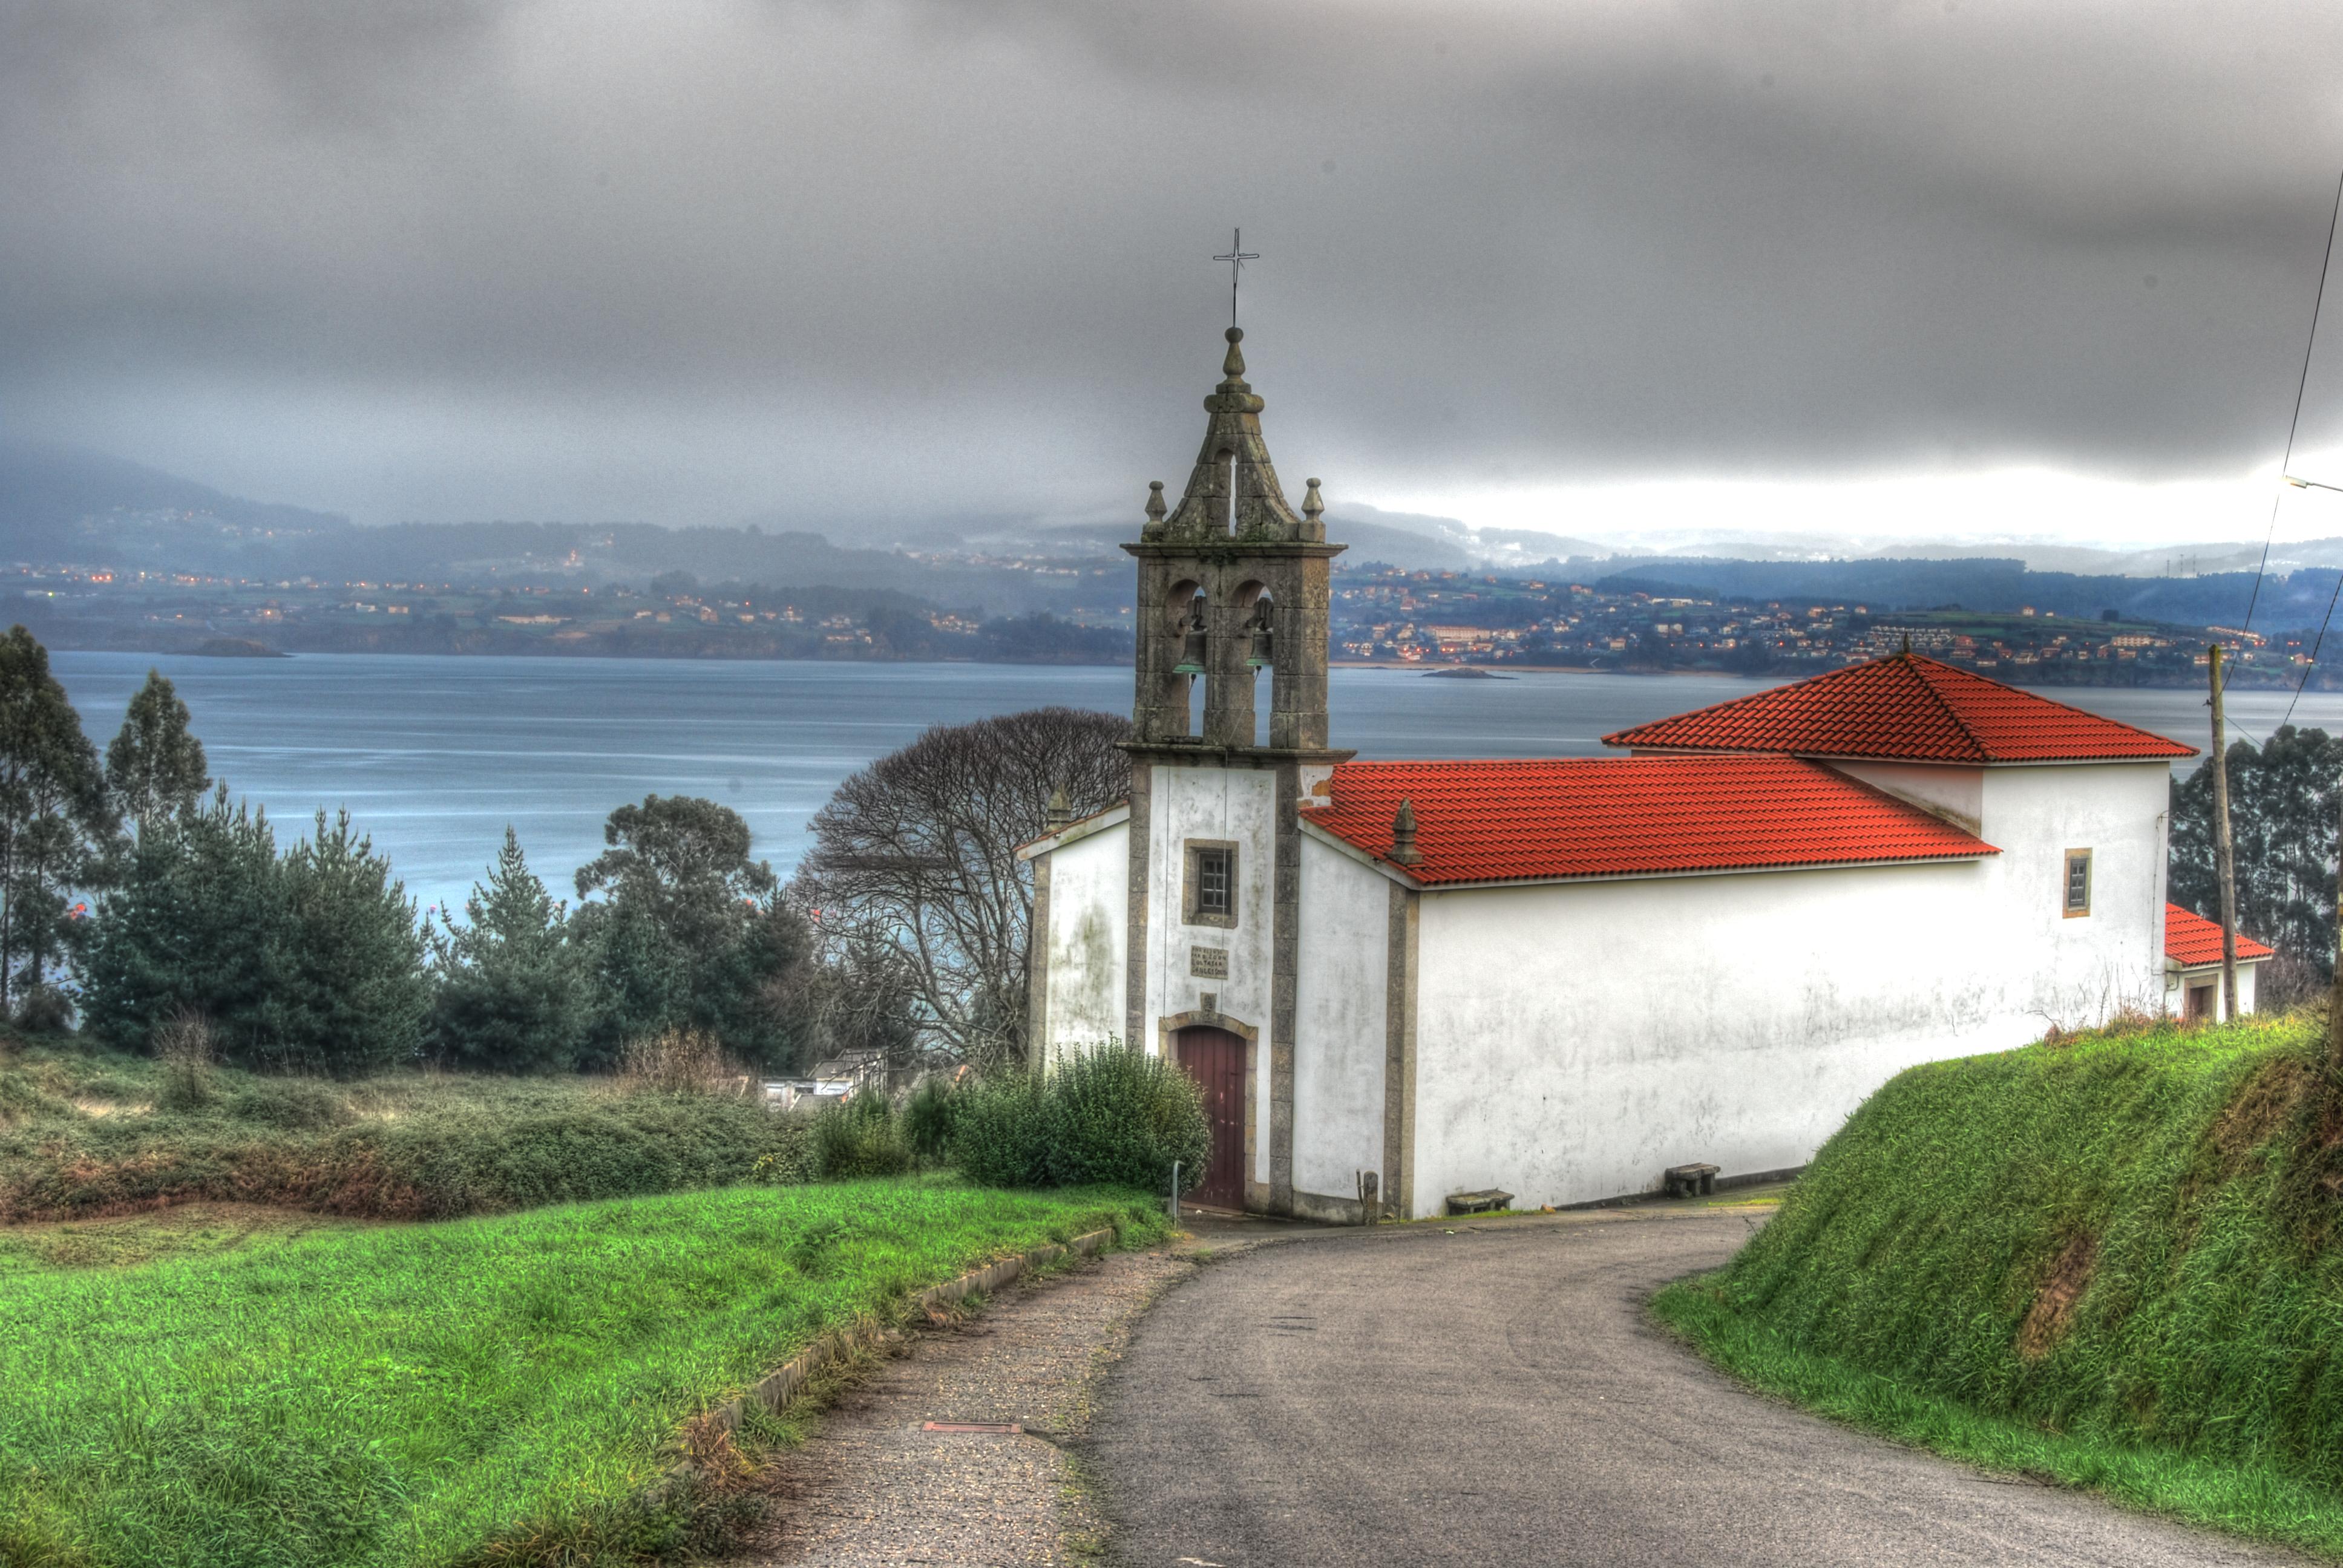 Foto playa Lobos. Iglesia de Carnoedo - Sada - La Coruña